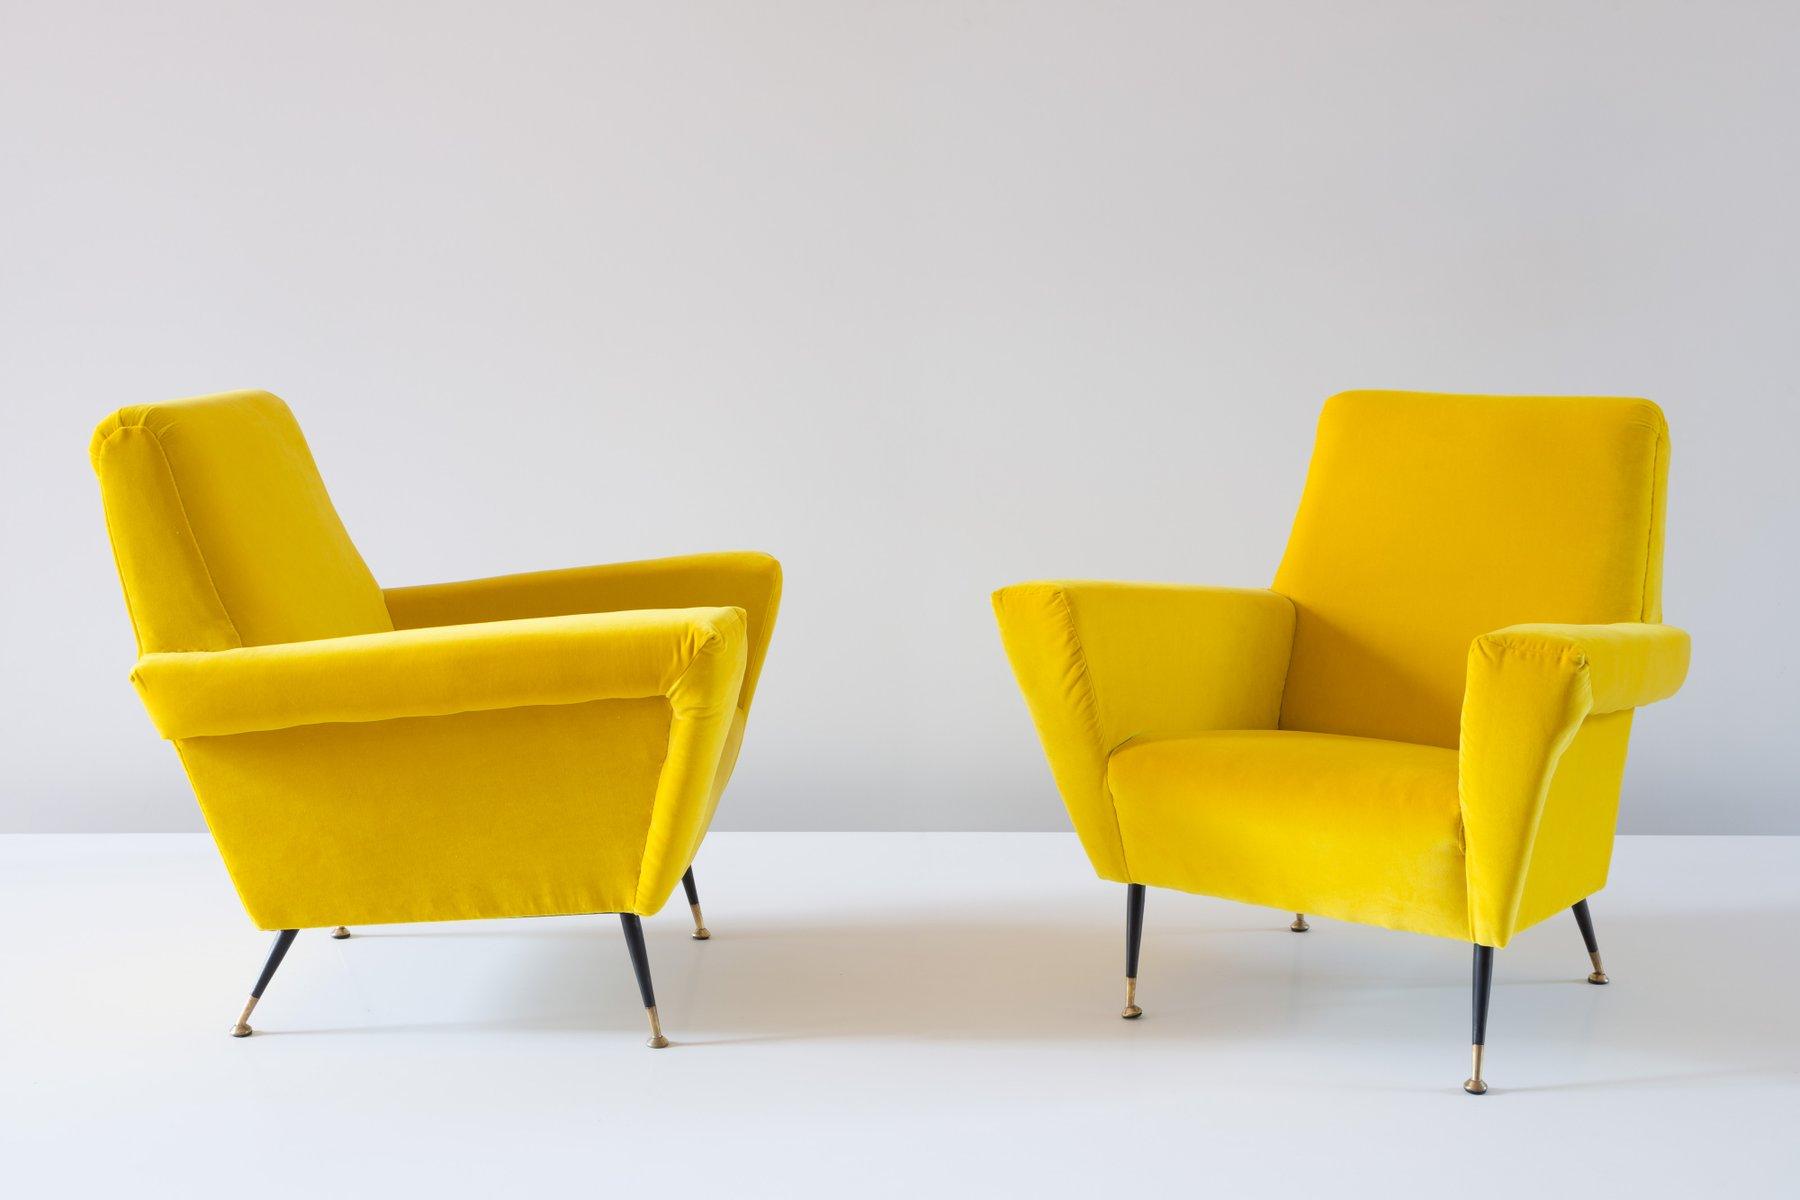 italienische vintage samt sessel in gelb 1950er 2er set bei pamono kaufen. Black Bedroom Furniture Sets. Home Design Ideas